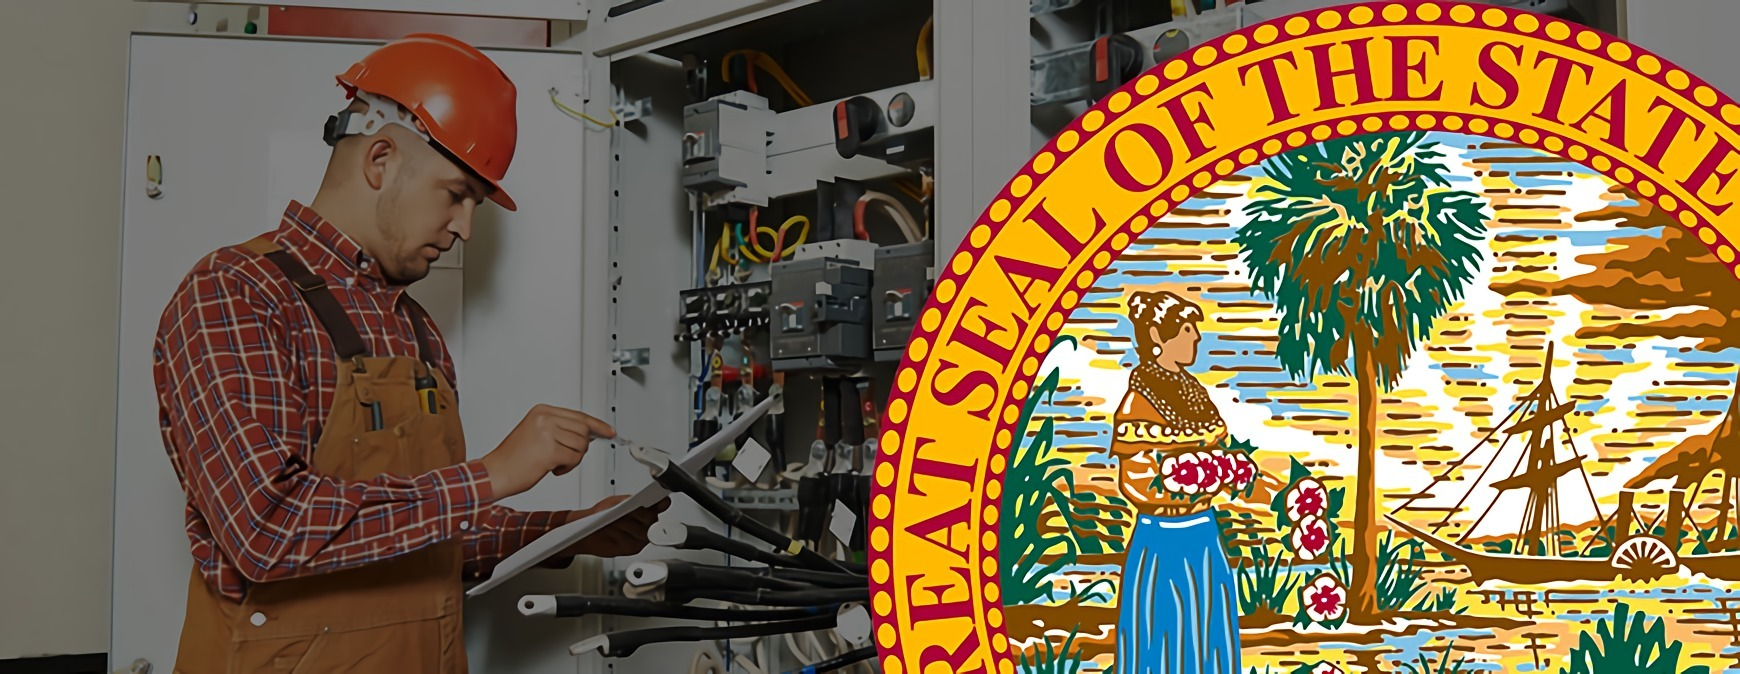 The Growing Demand For Electricians In Florida Tulsa Welding School